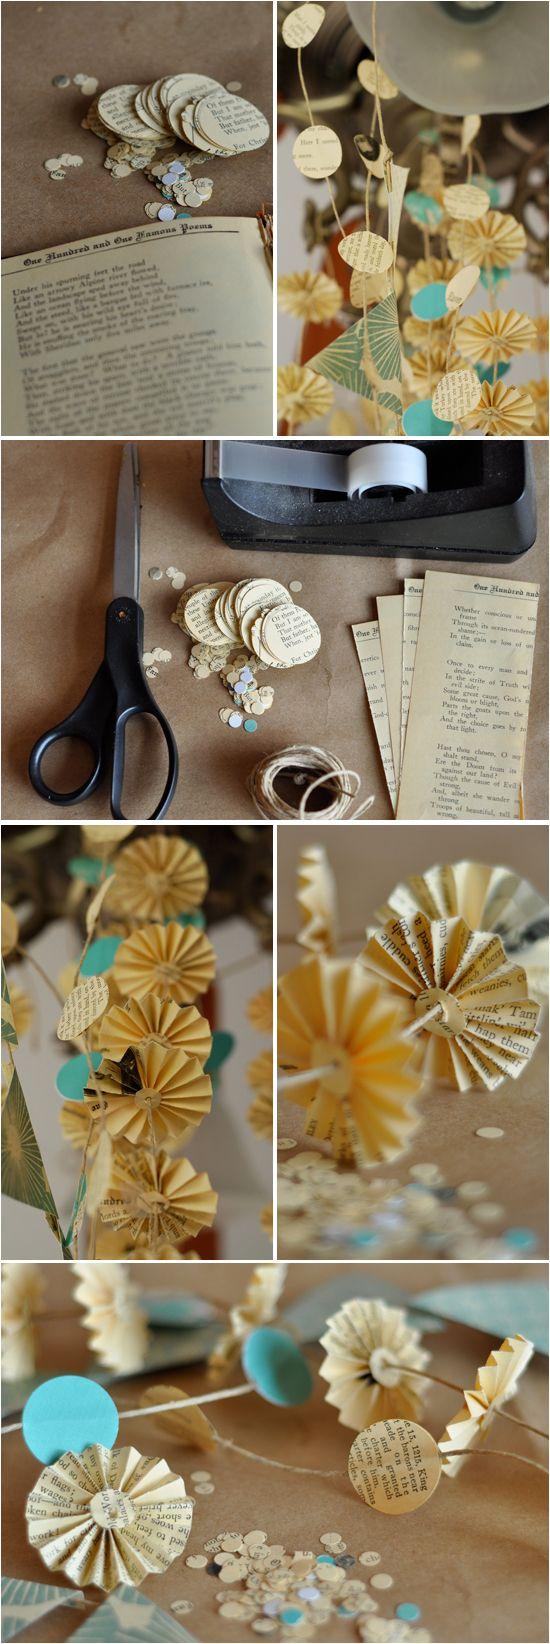 Wedding decorations paper  BigDay weddings  DIY  DIY  Pinterest  Diy wedding decorations